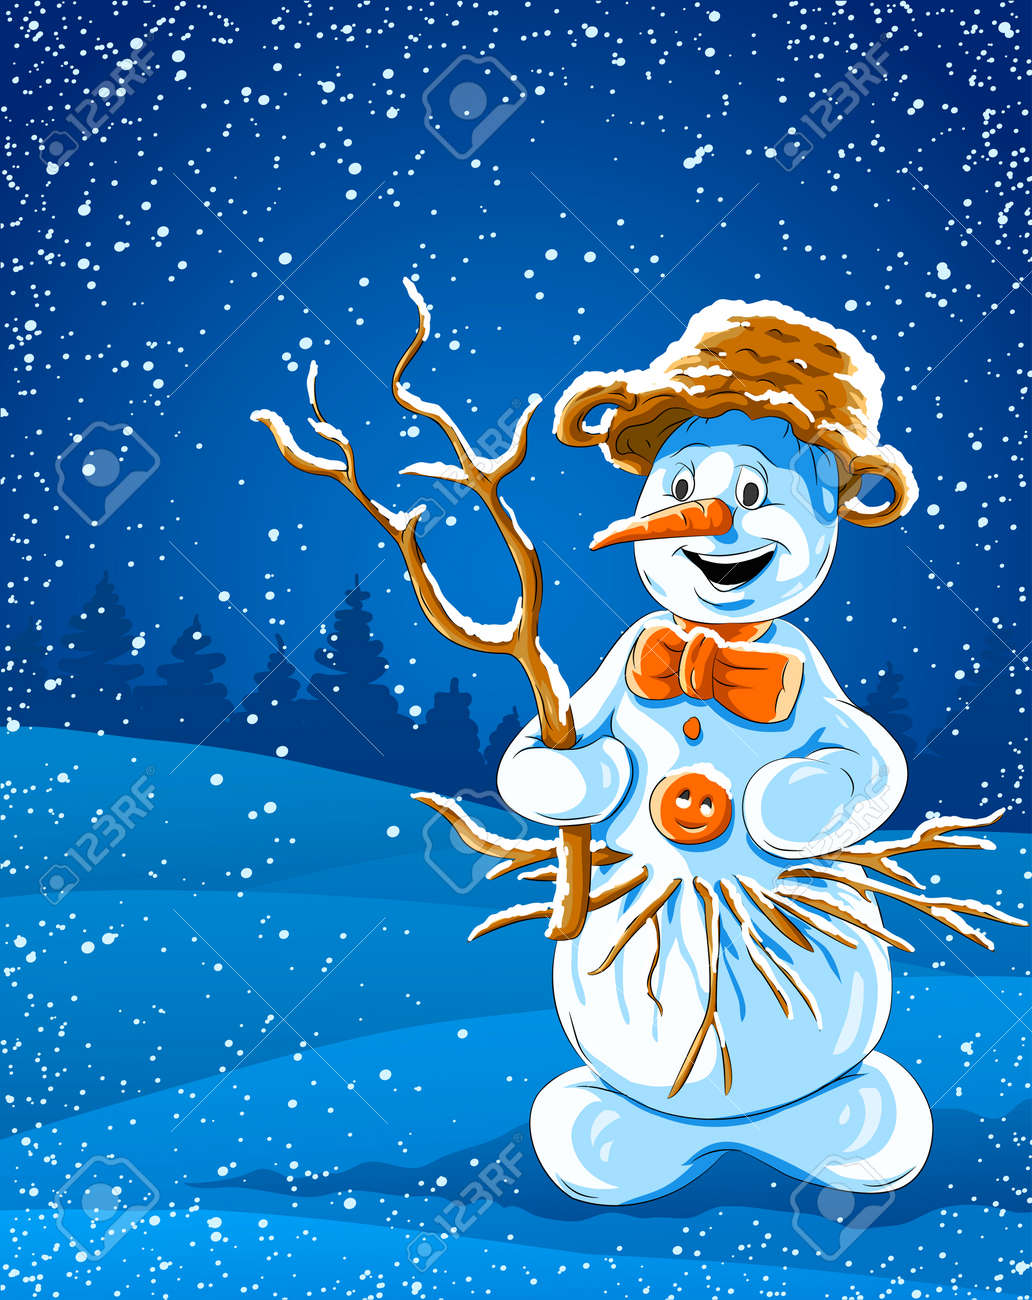 smiling snowman in winter night - vector illustration Stock Vector - 6041498